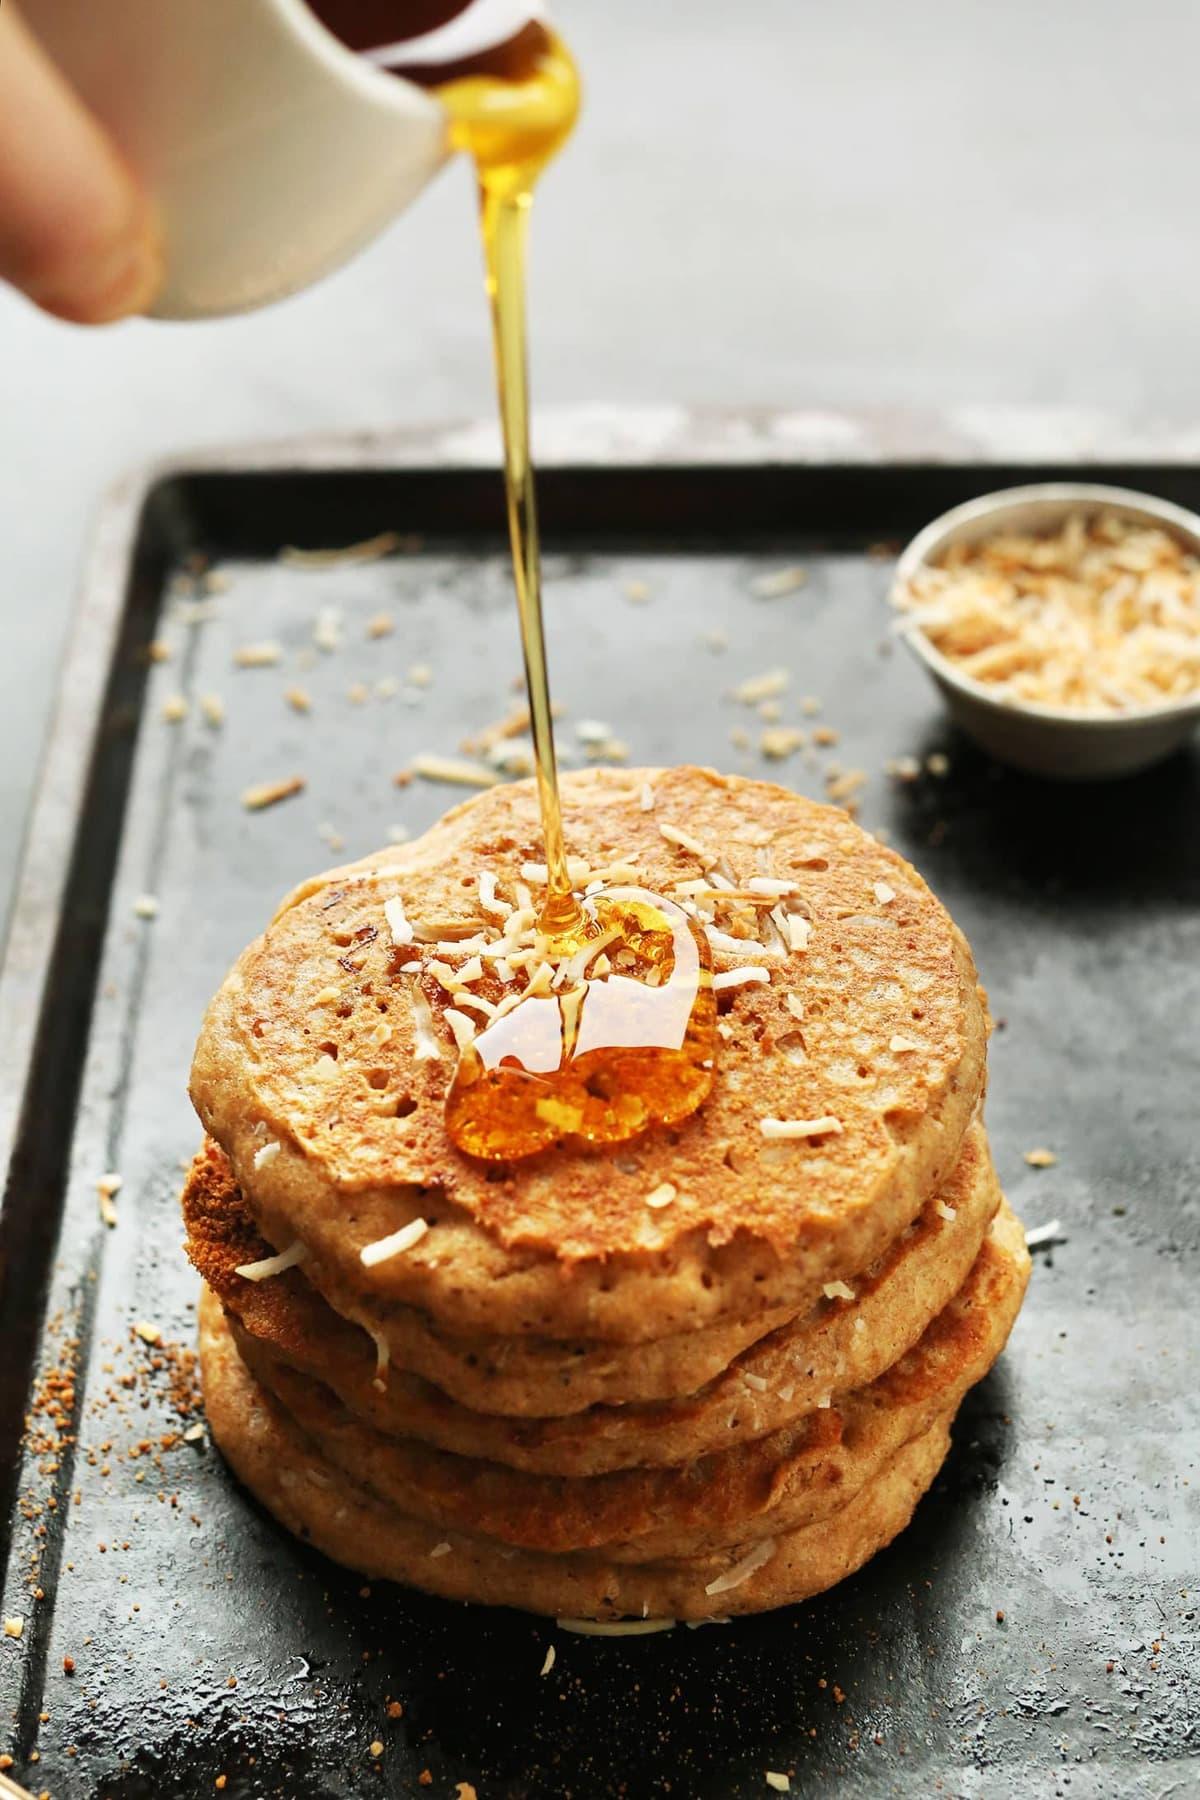 Toasted Cocoanut Pancakes